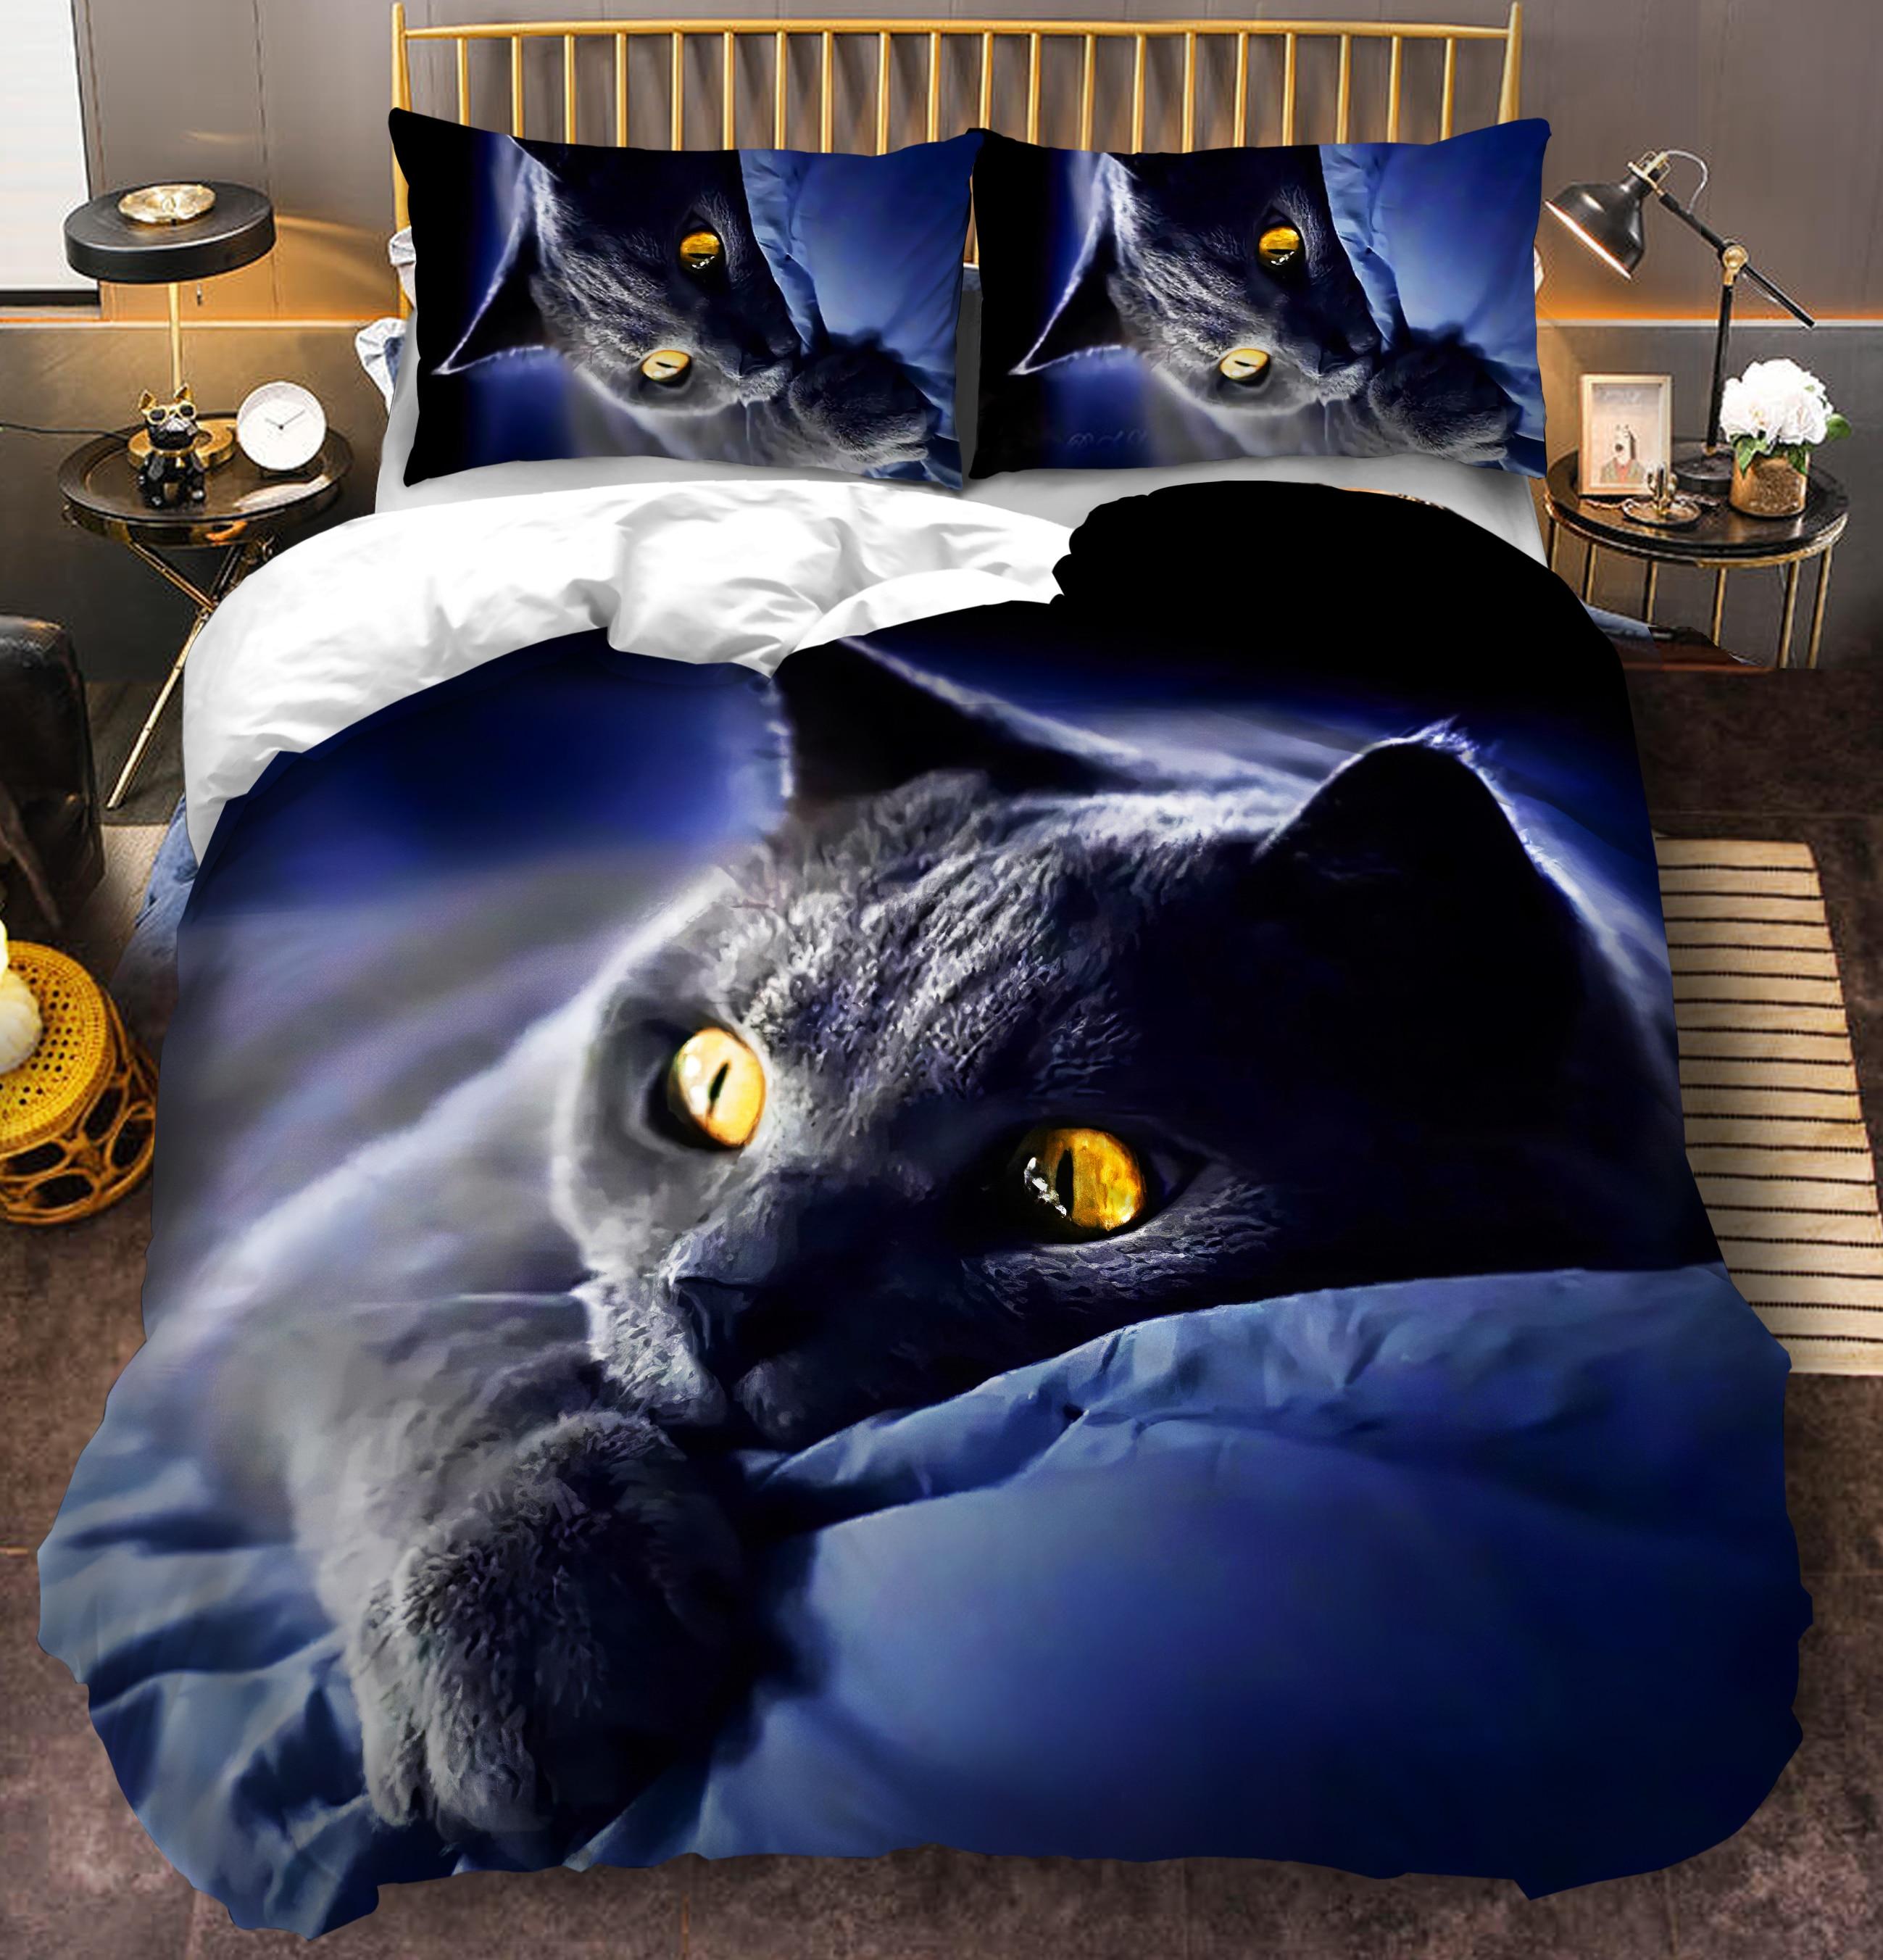 3D Cat Bedding Set for Girls Boys Cute Colorful Cat Pattern Bedspread 3 Piece Bold Color Black Animal Duvet Cover Set